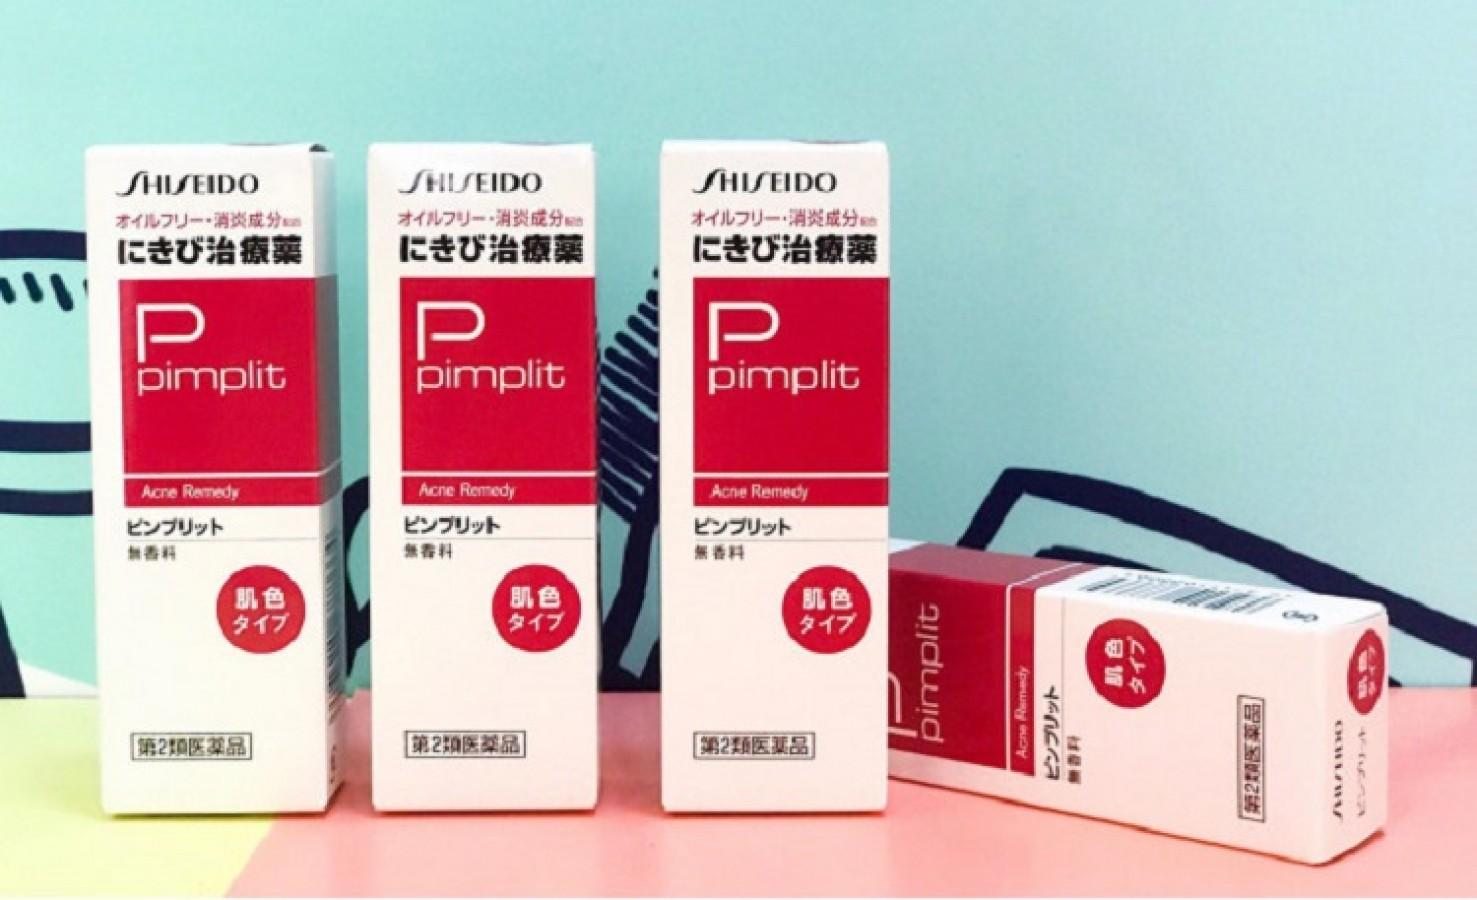 Kem Hỗ Trợ Trị Mụn Shiseido Pimplit Nhật Bản